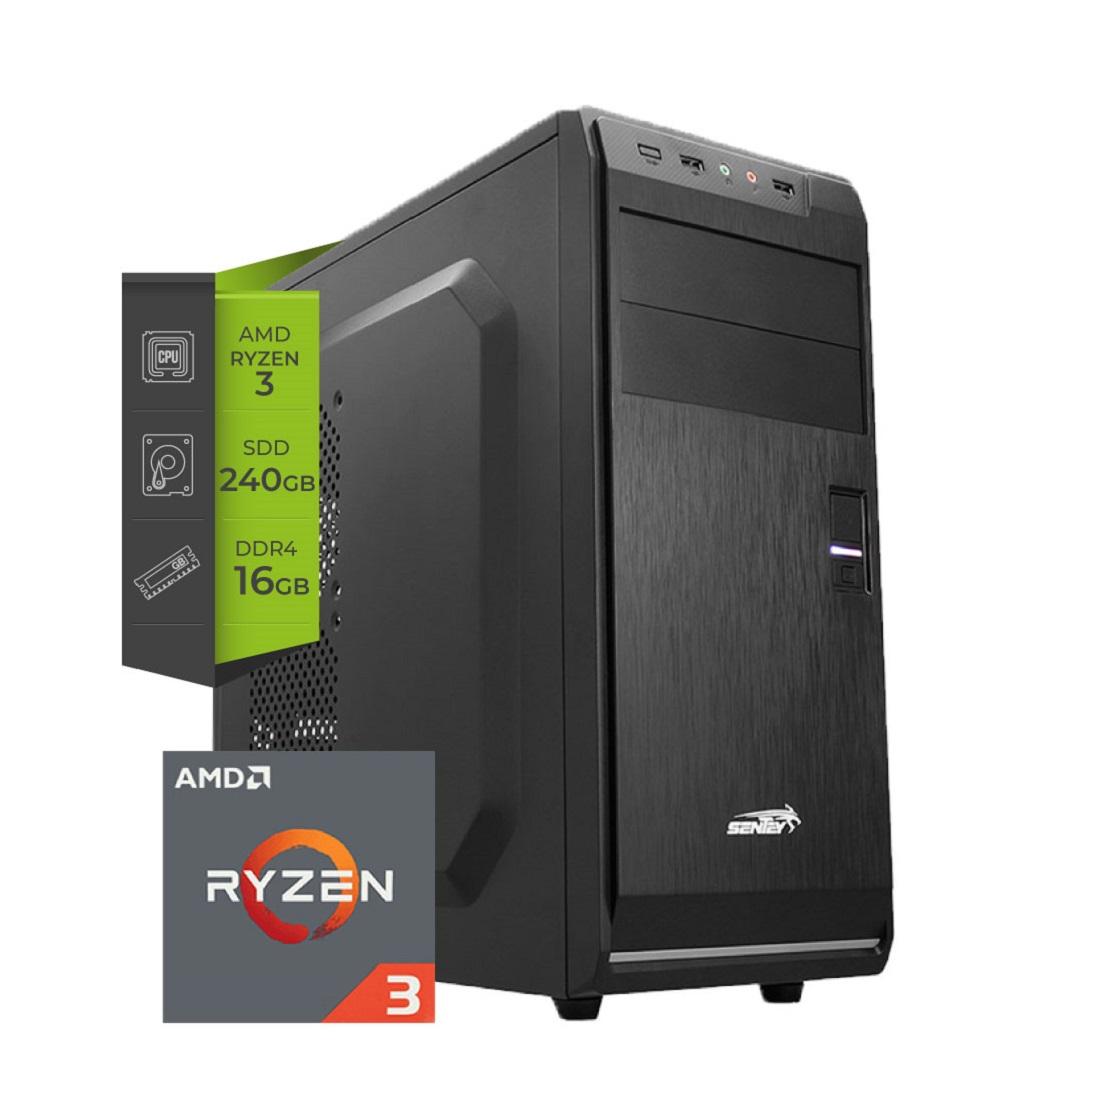 Pc AMD Gamer Ryzen 3 Pro 4350G 16Gb SSD 240Gb (Simil 3400G )